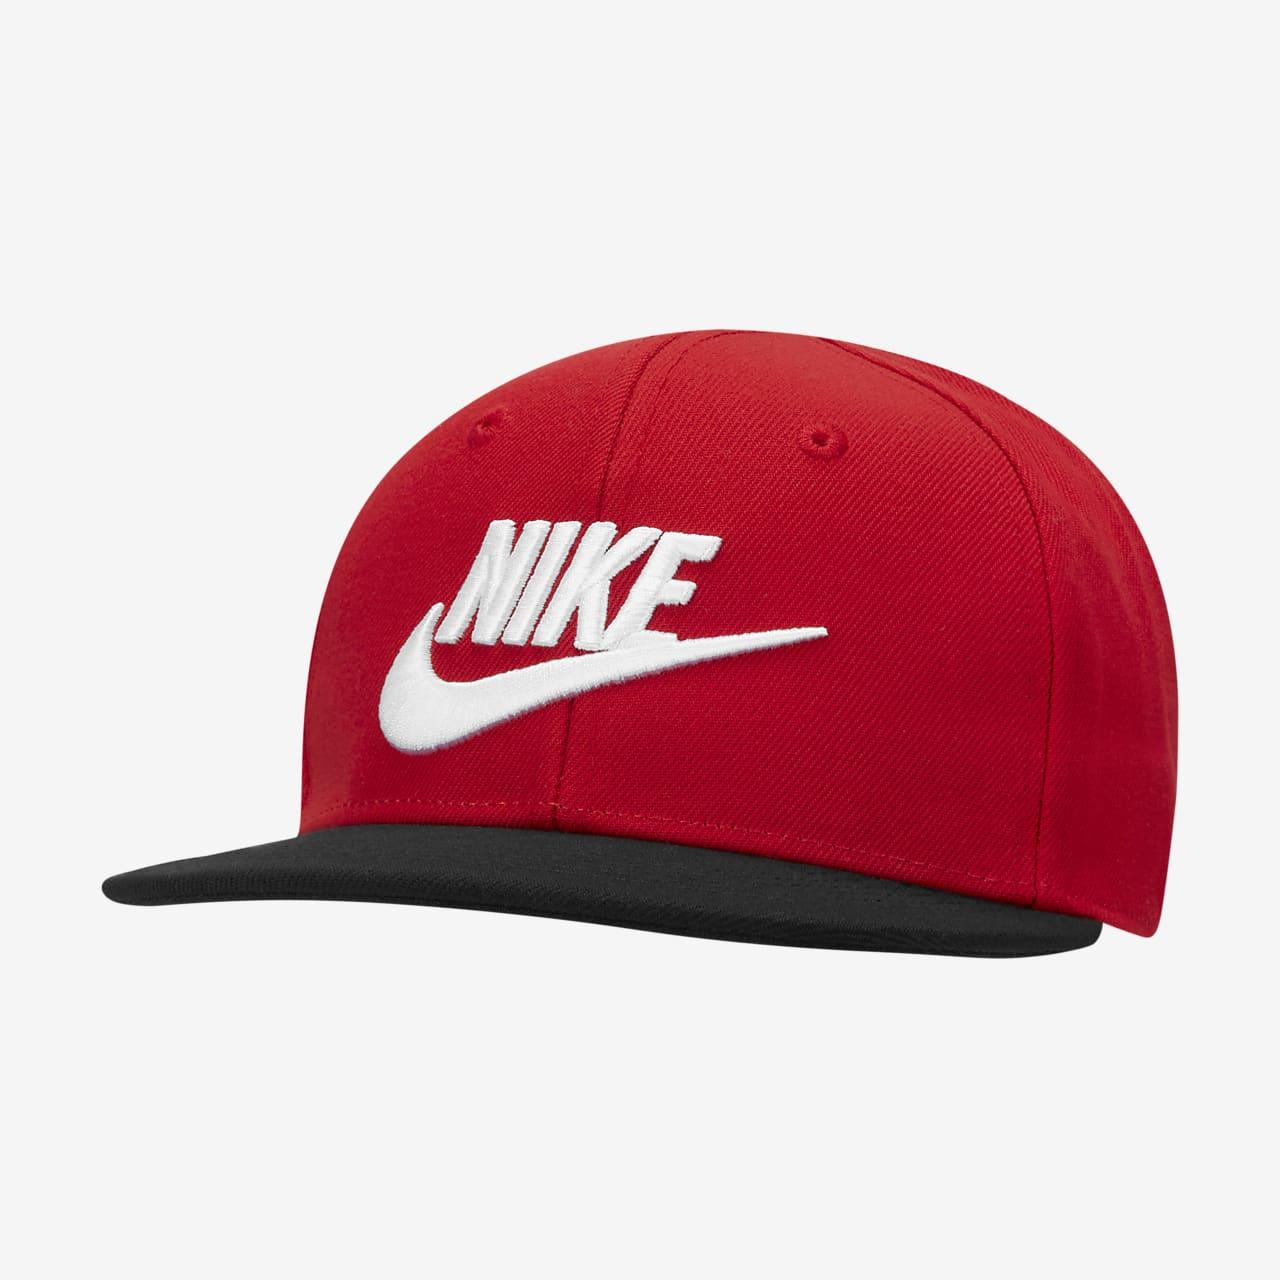 Nike Little Kids' Adjustable Hat